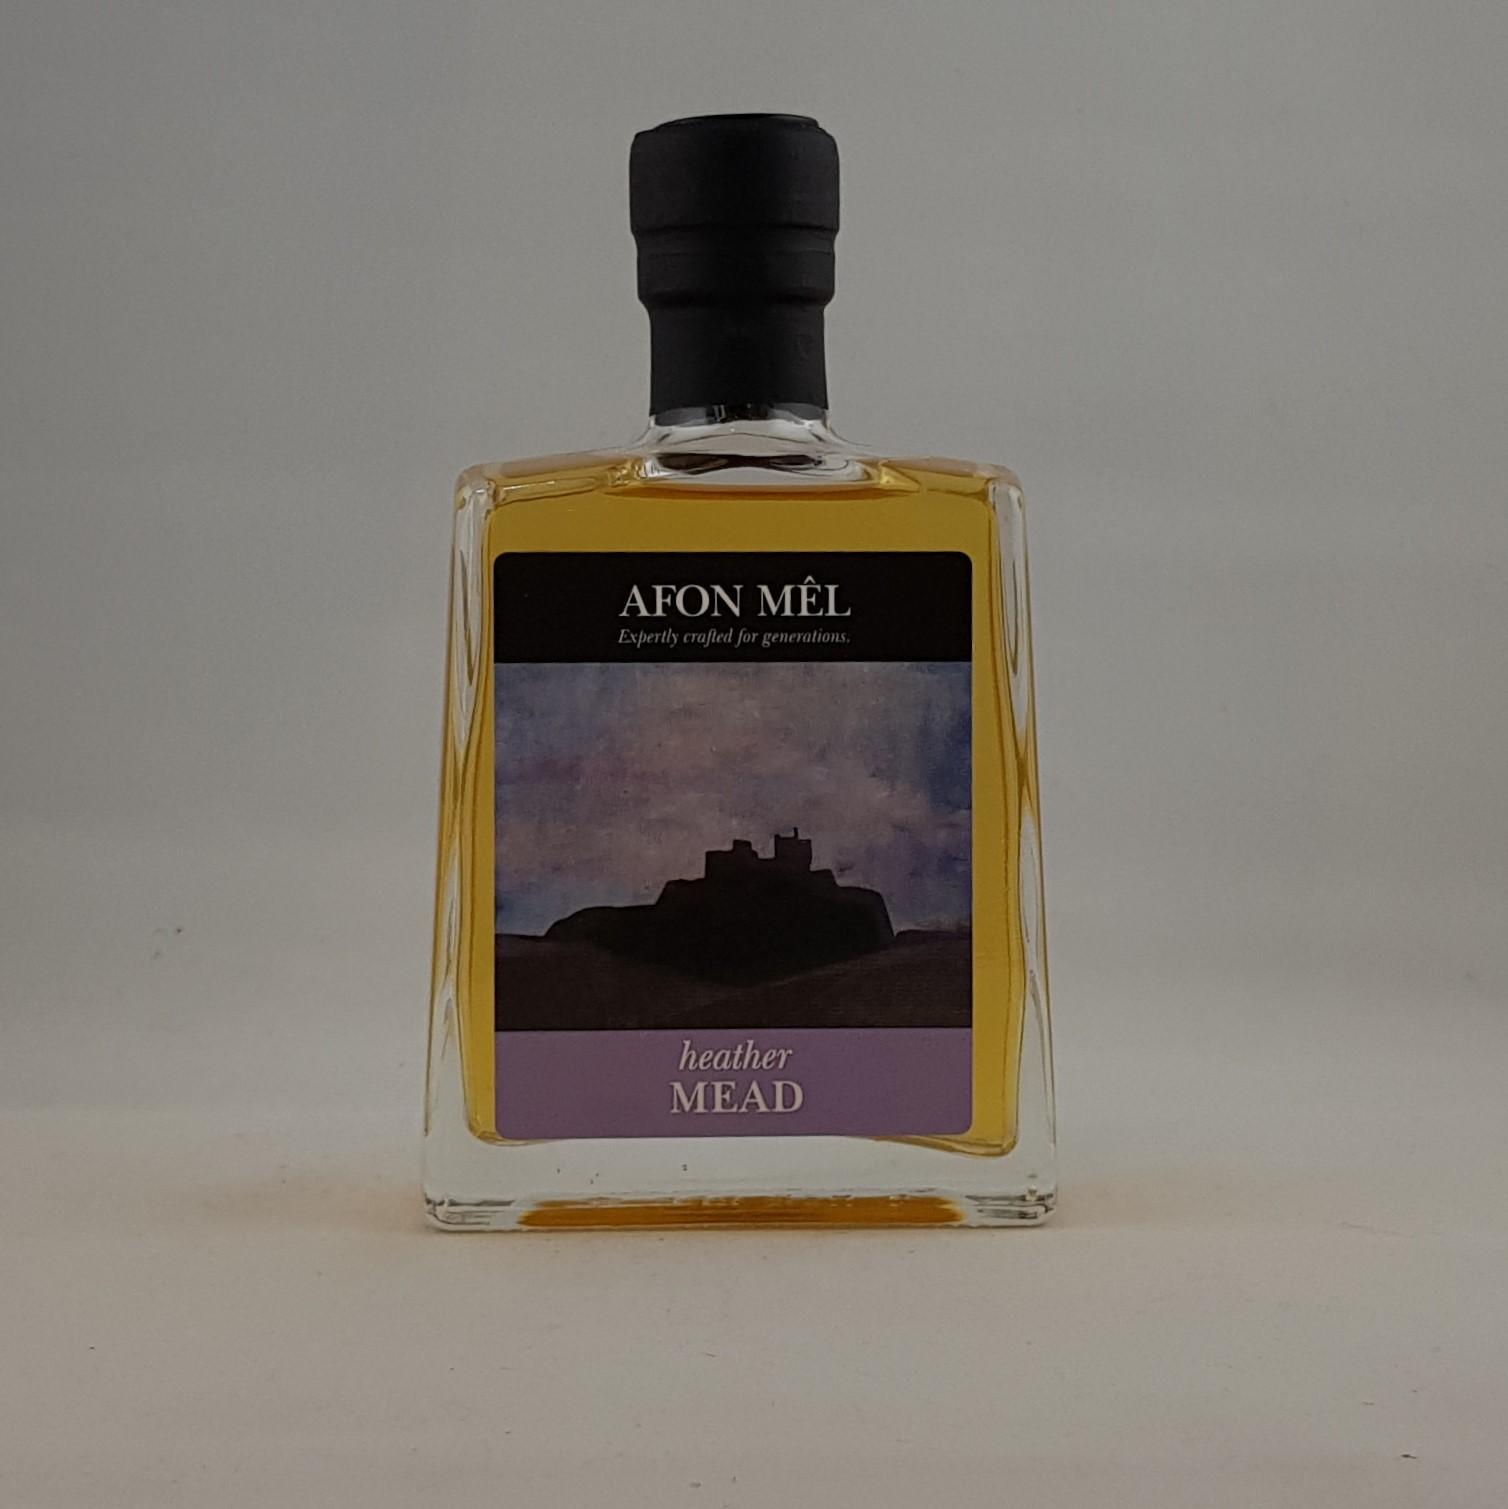 Afon Mel Honey Mead